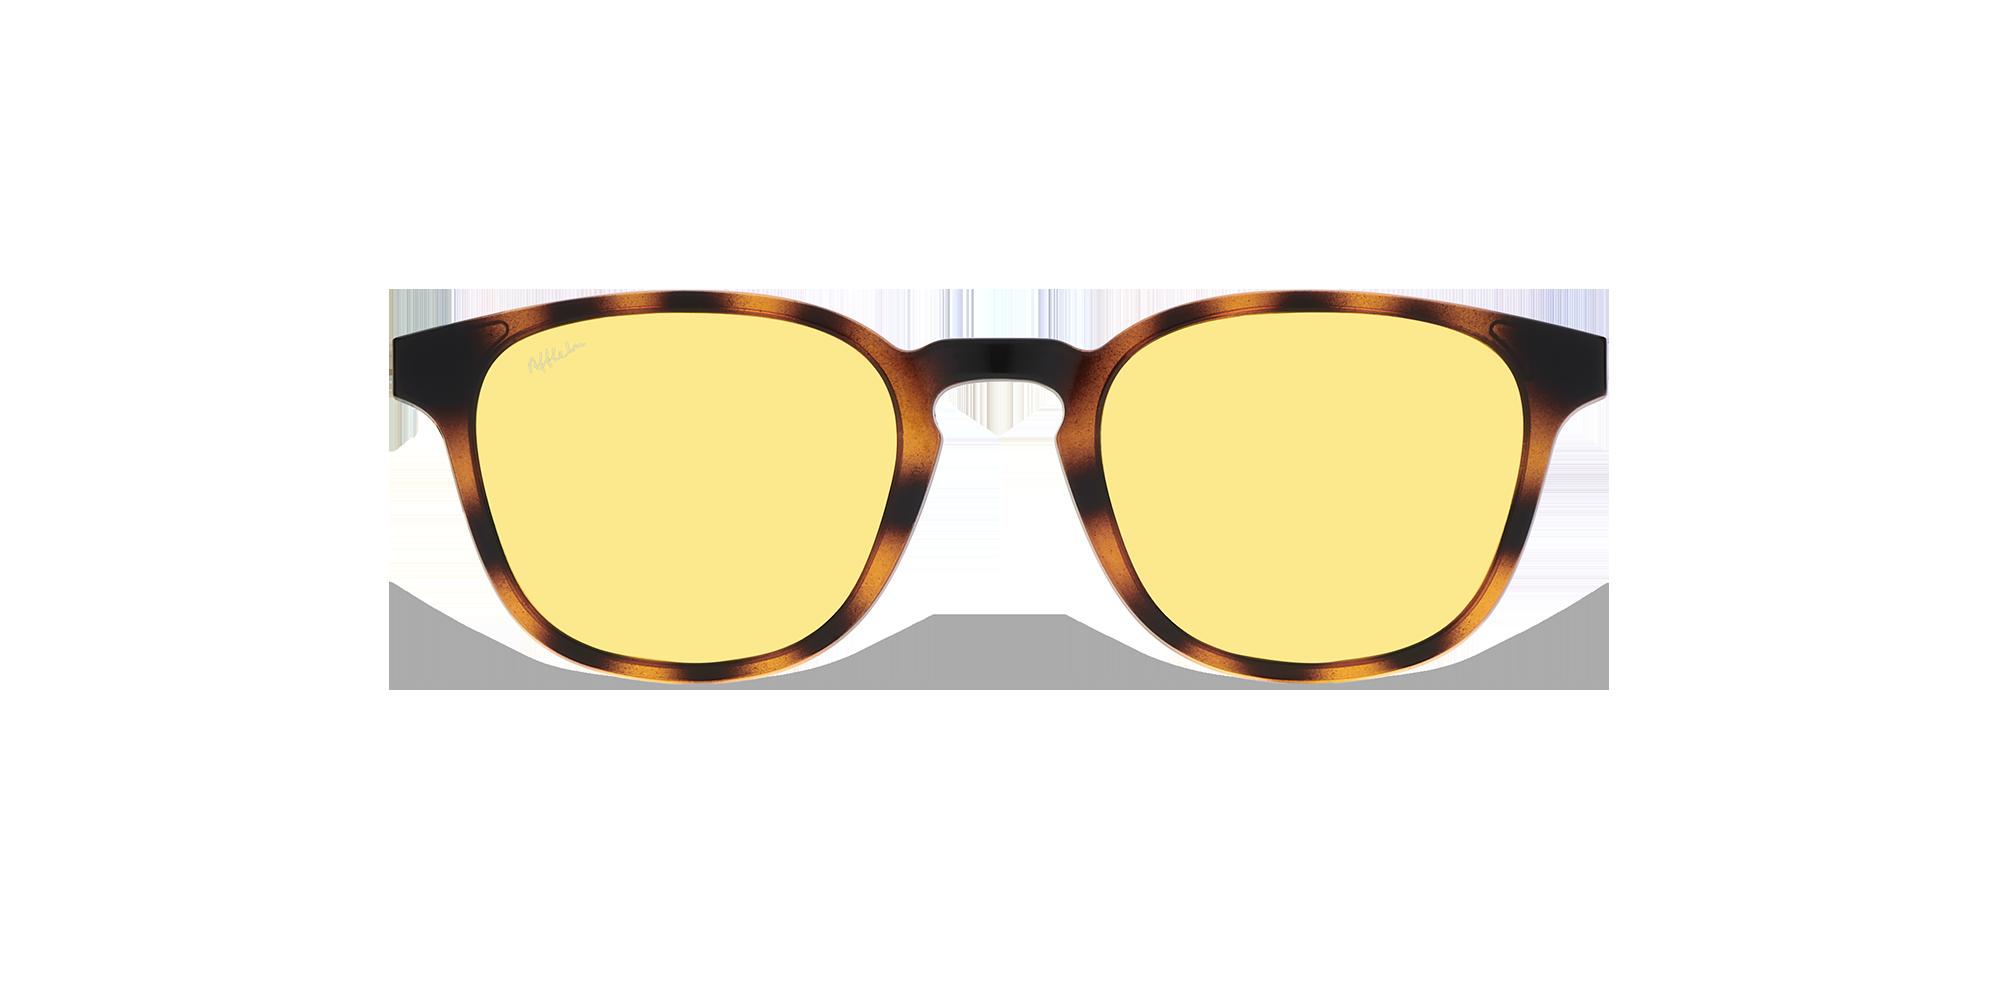 afflelou/france/products/smart_clip/clips_glasses/07630036429273_face.png